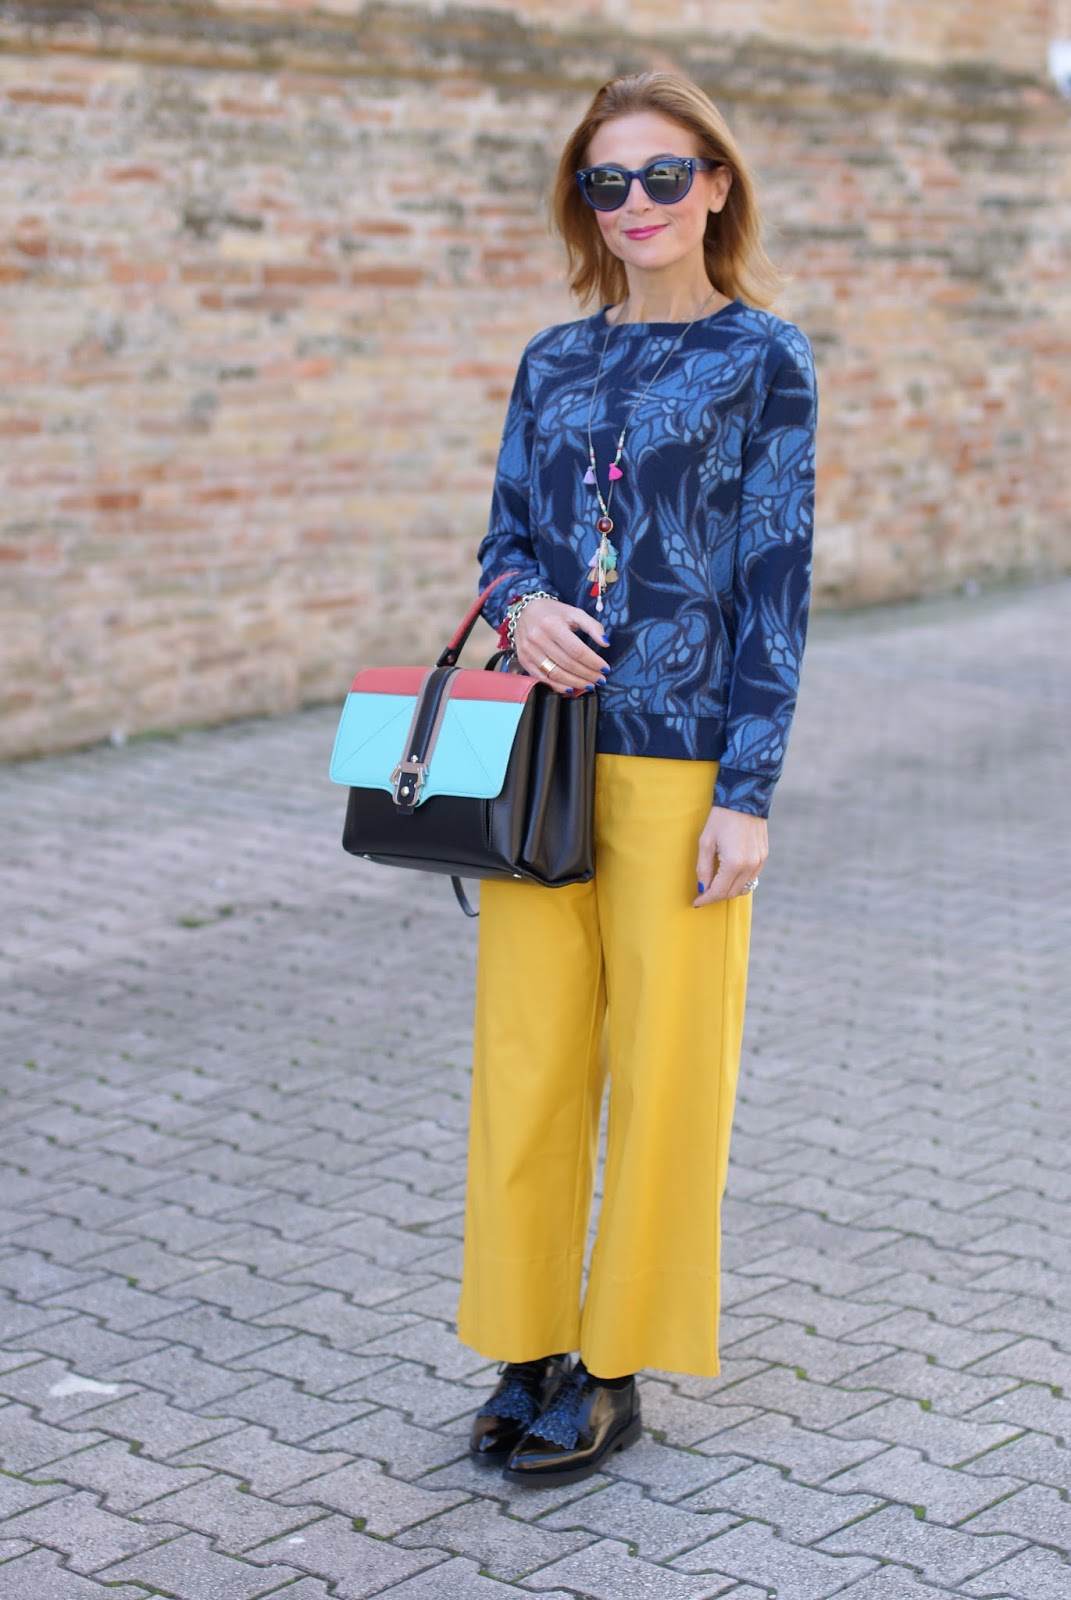 Paula Cademartori Faye handbag, yellow culottes pants for fall and Hype Glass on Fashion and Cookies fashion blog